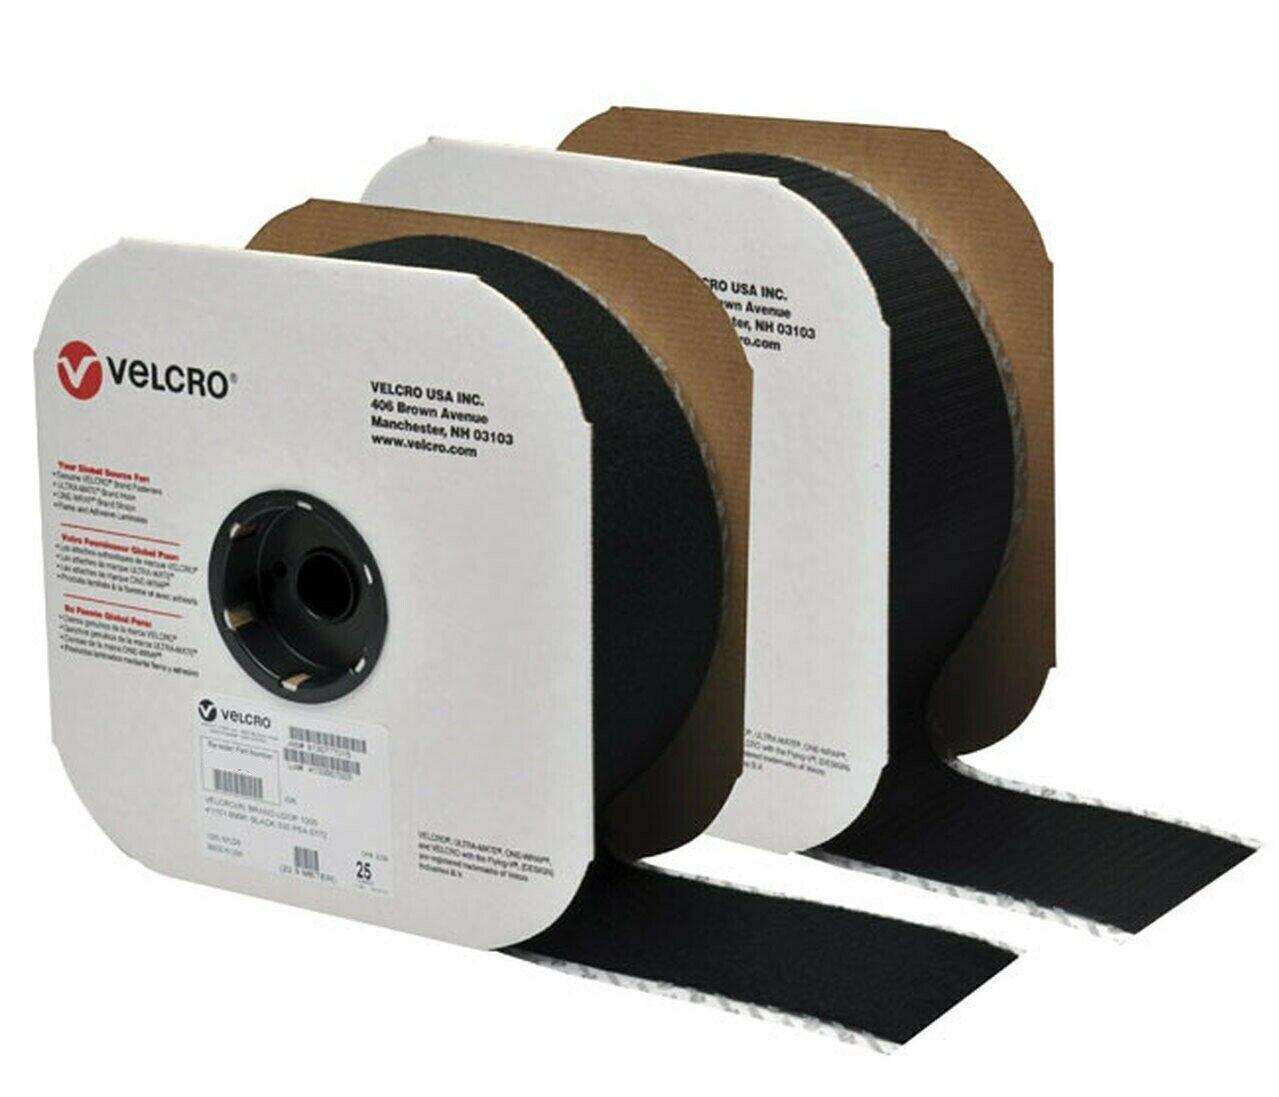 "4"" Wide VELCRO® Brand High Tack Self Adhesive Tape Strip Se"